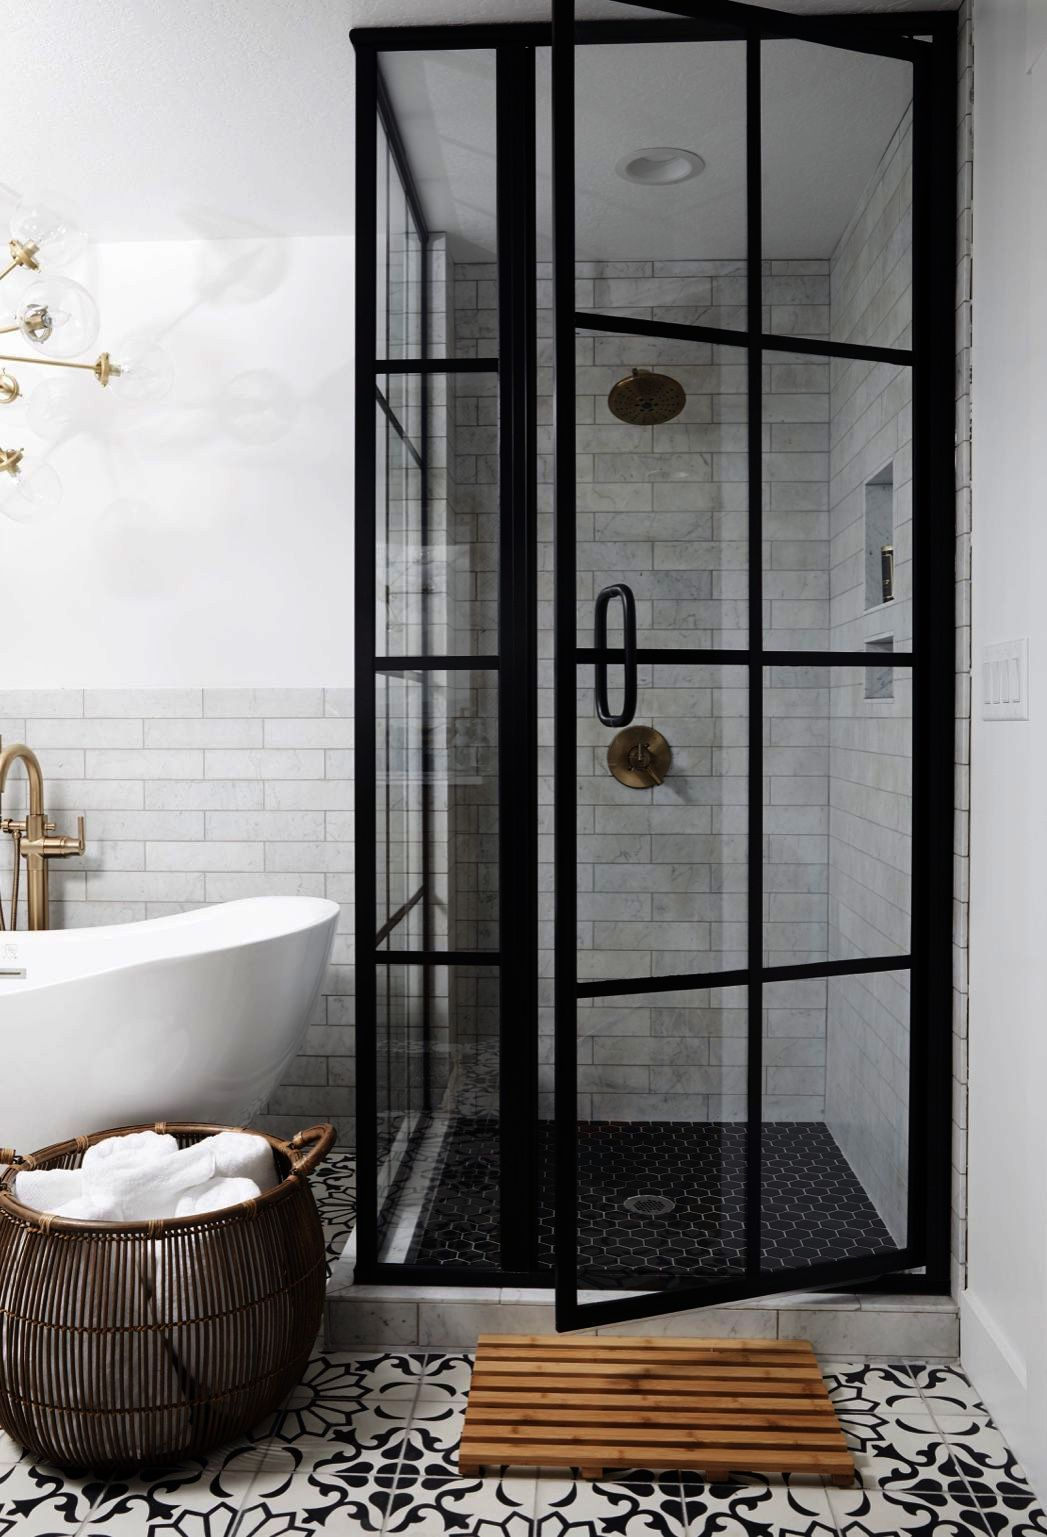 Pin On Dreamy Interiors Top bathroom ceramic inspiration